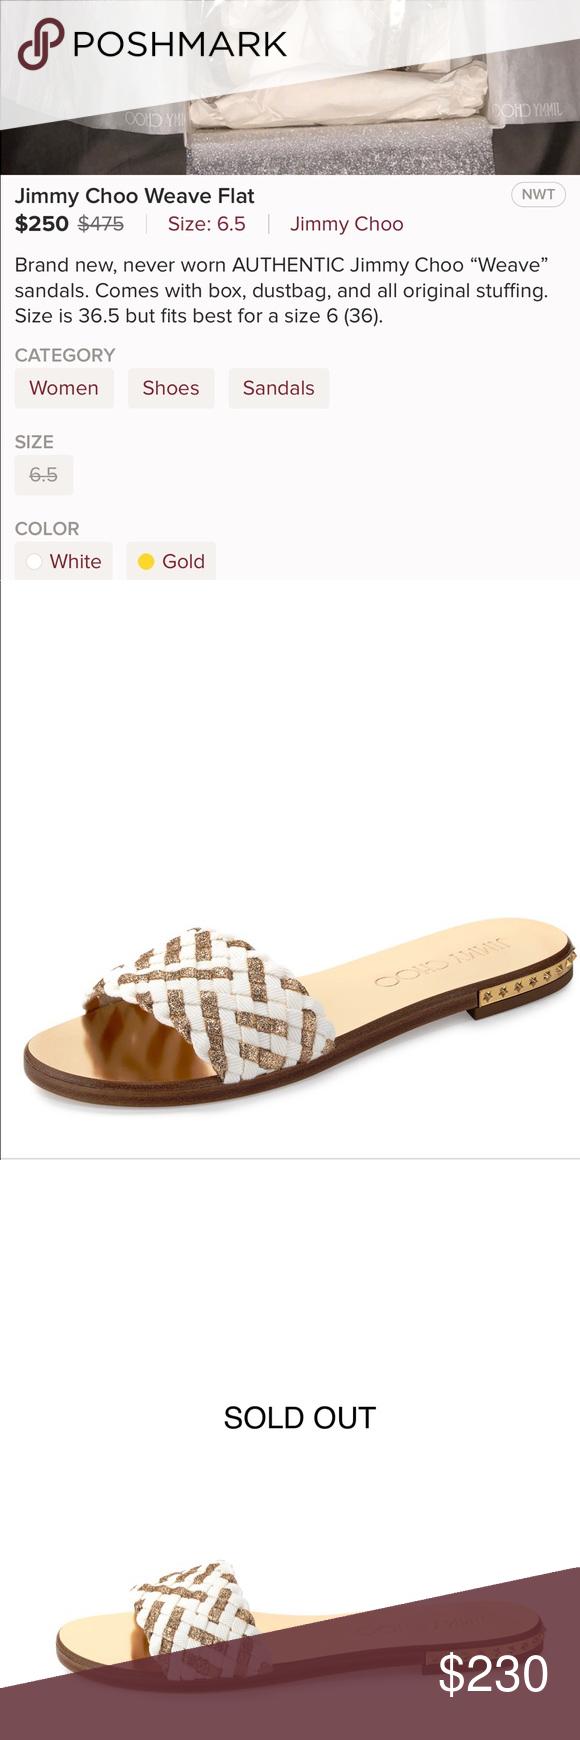 30d442789ece Jimmy Choo Weave Sandal Size 7 Authentic Jimmy Choo Weave Studded Slide  Sandal Size 7. Authentic. Latte Gold. Worn once